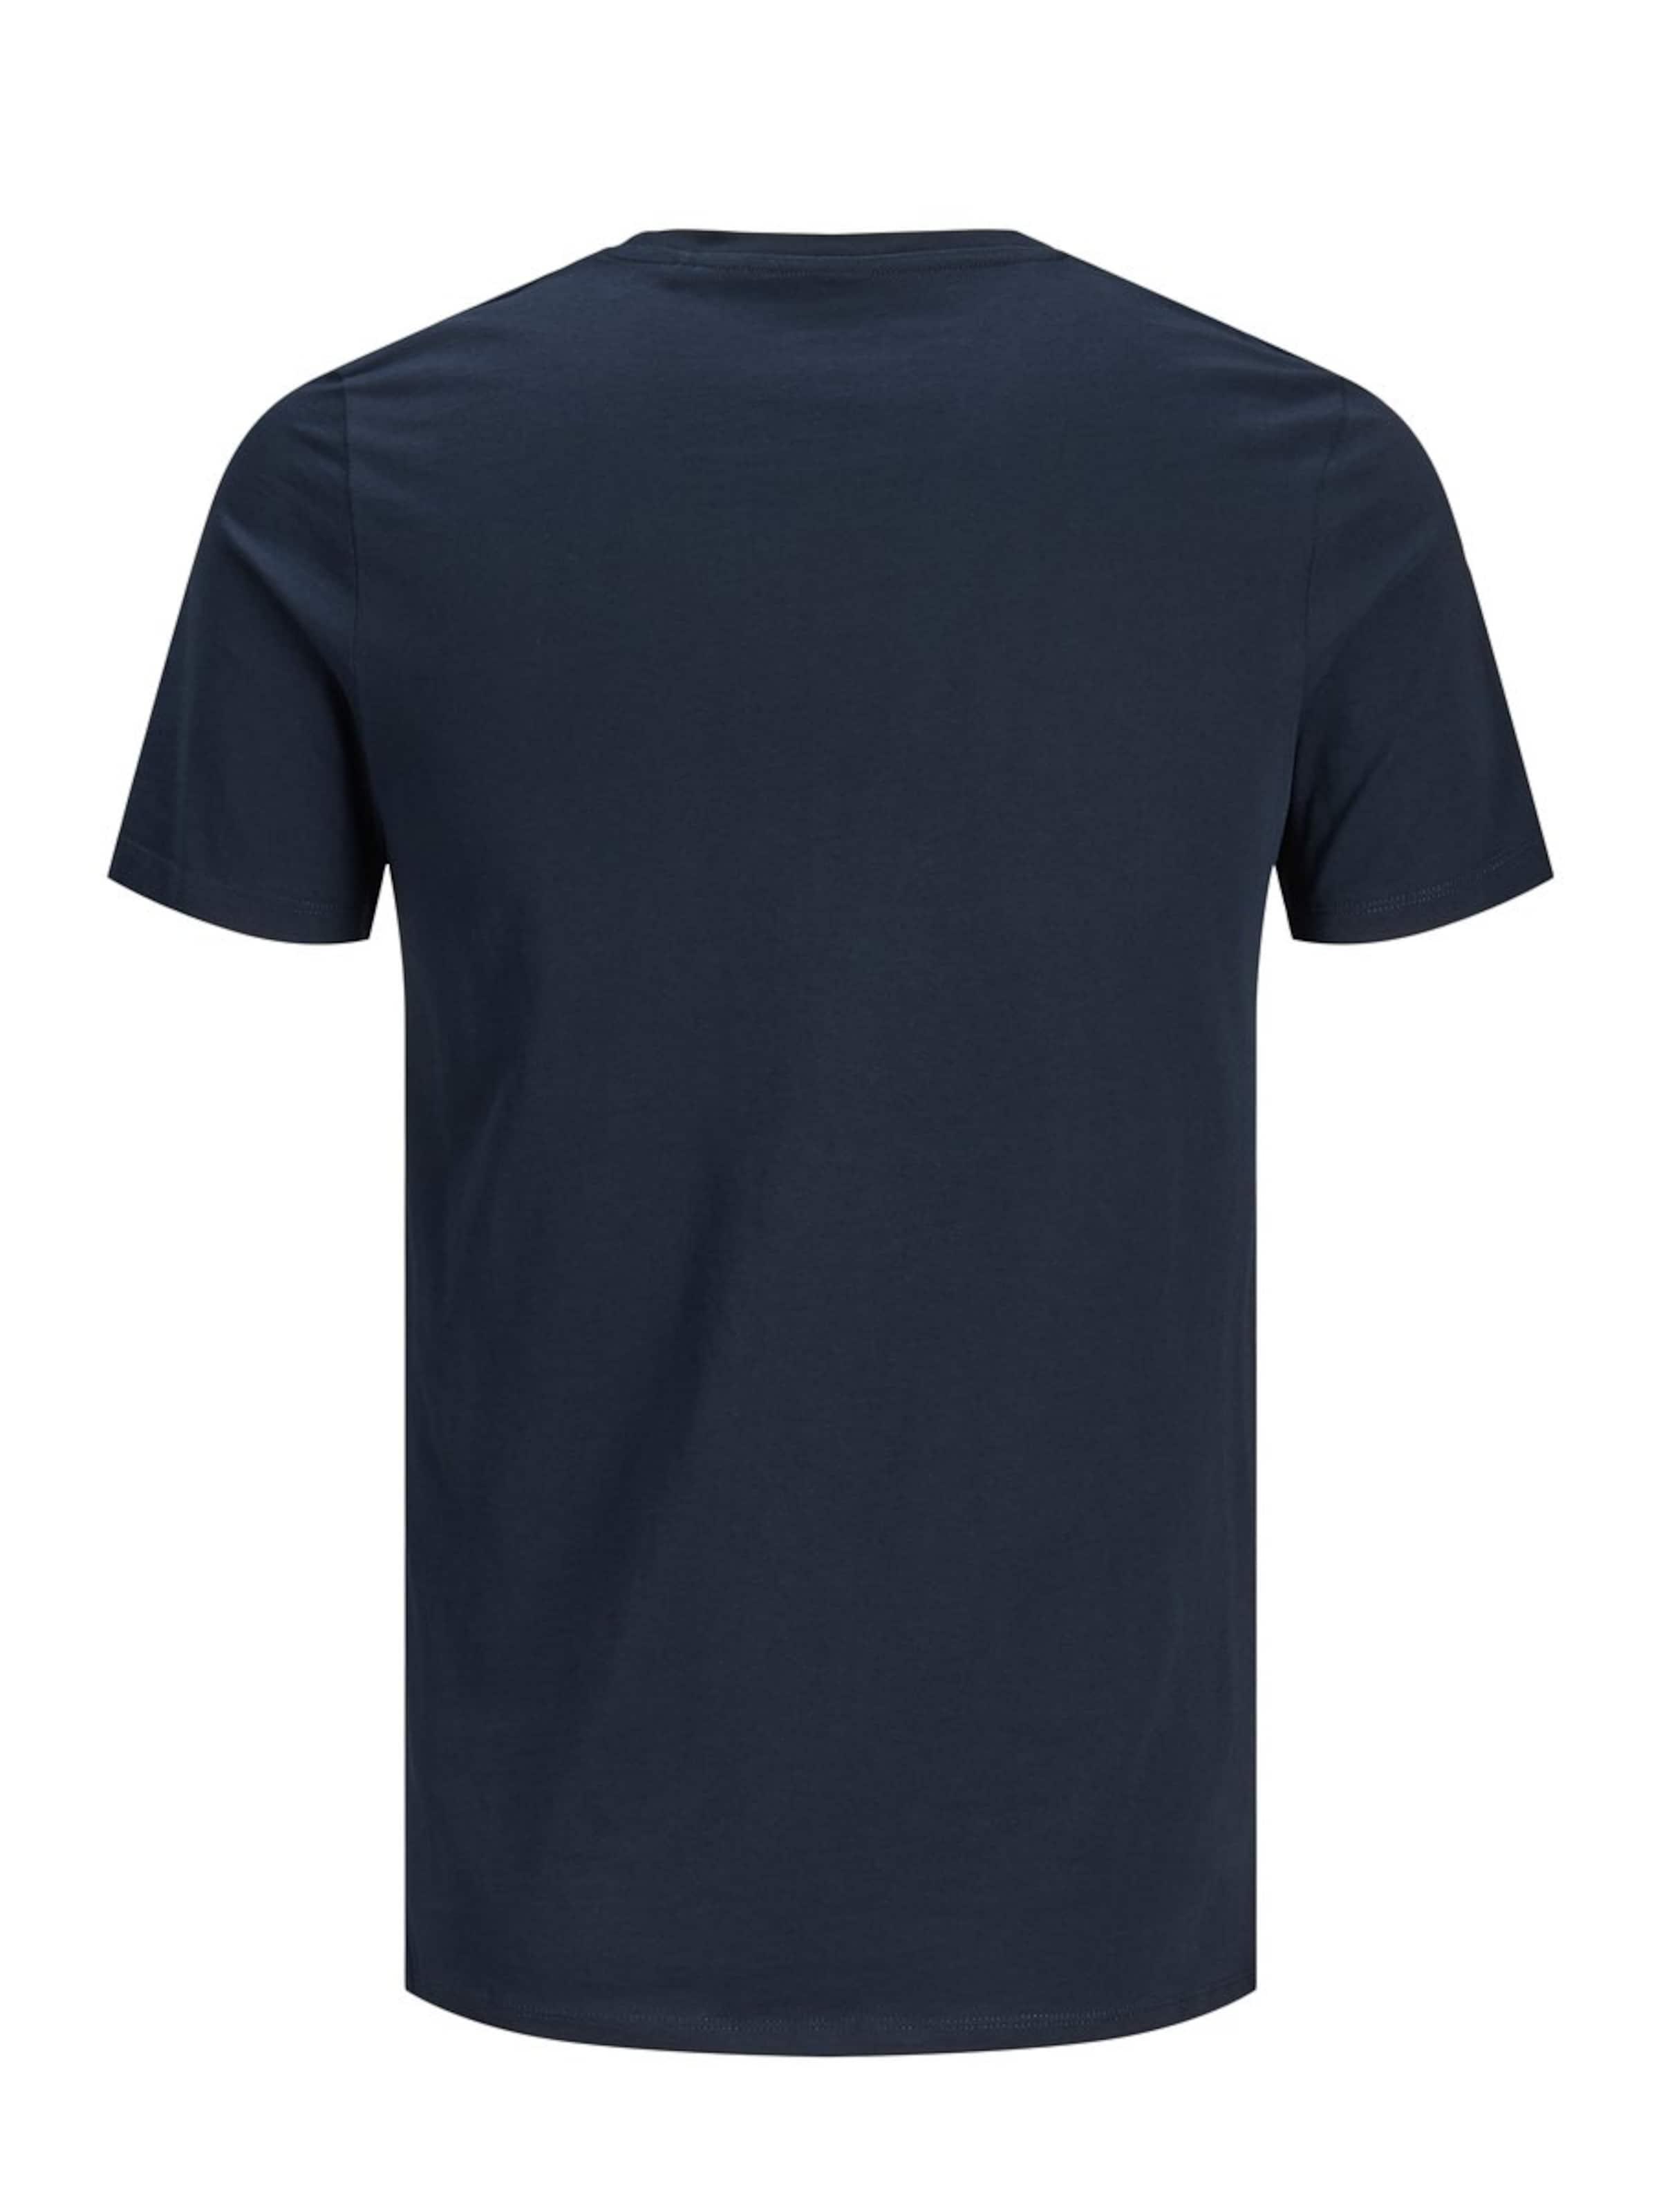 Jackamp; Jones shirt T NachtblauWeiß In Ib6ym7fYgv